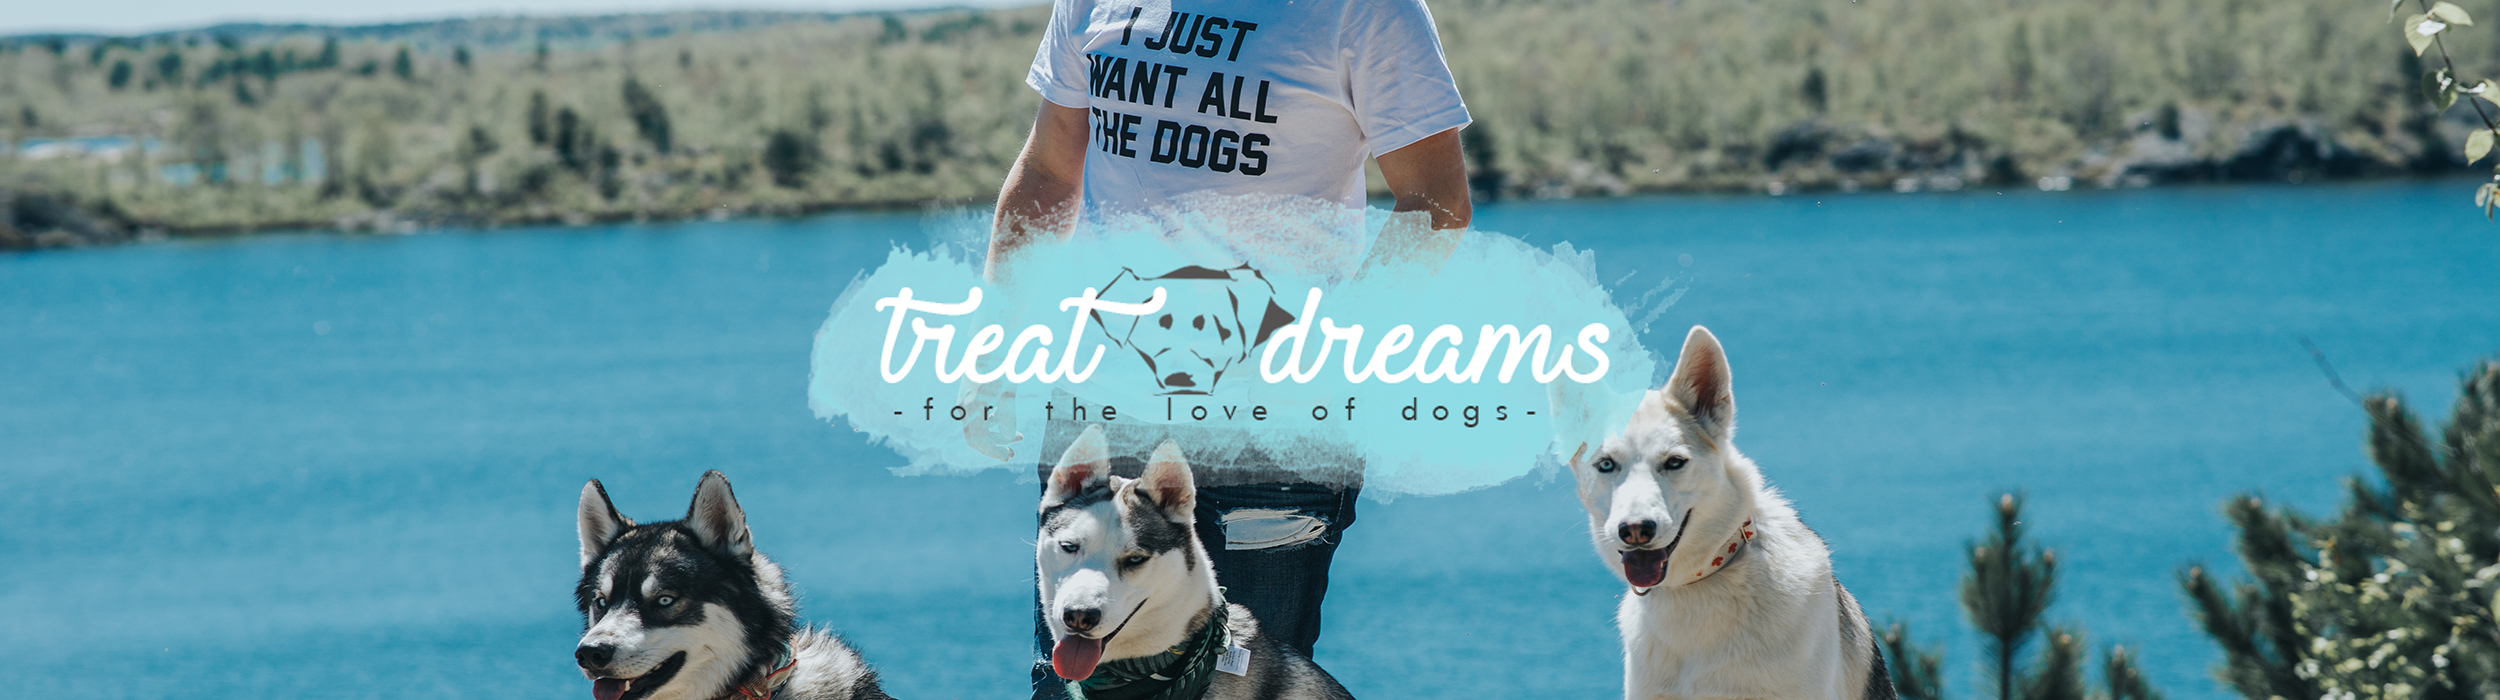 treatdreams.jpg